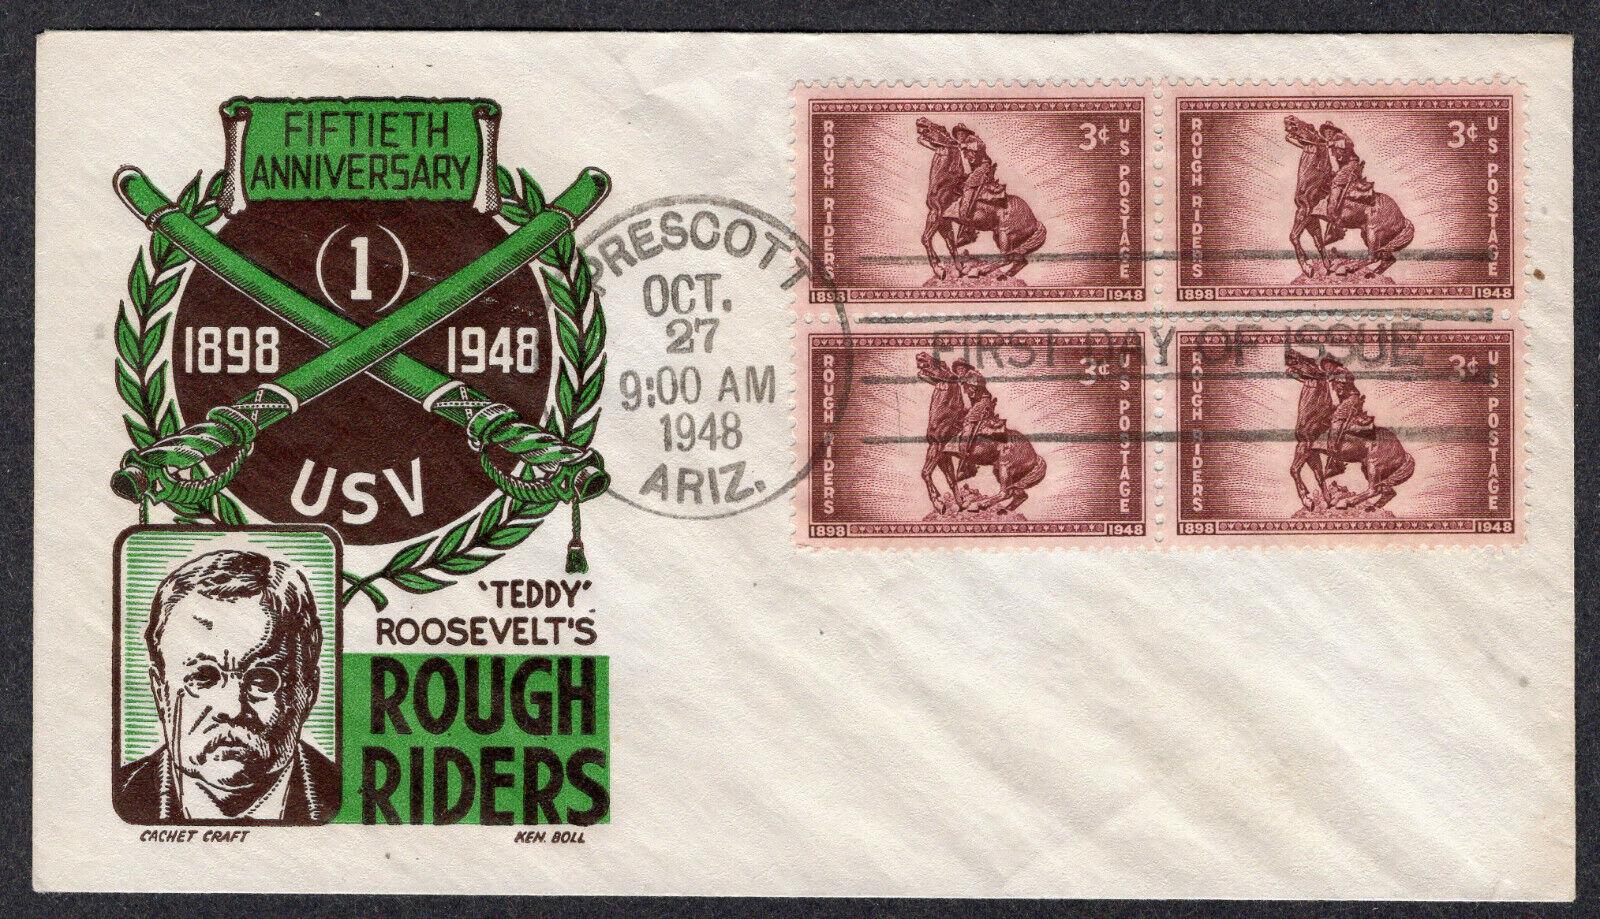 1948 Rough Riders 50th Scott 973 Blk/4 - Boll 2-Color Cachet Craft FDC QF867 - $2.25